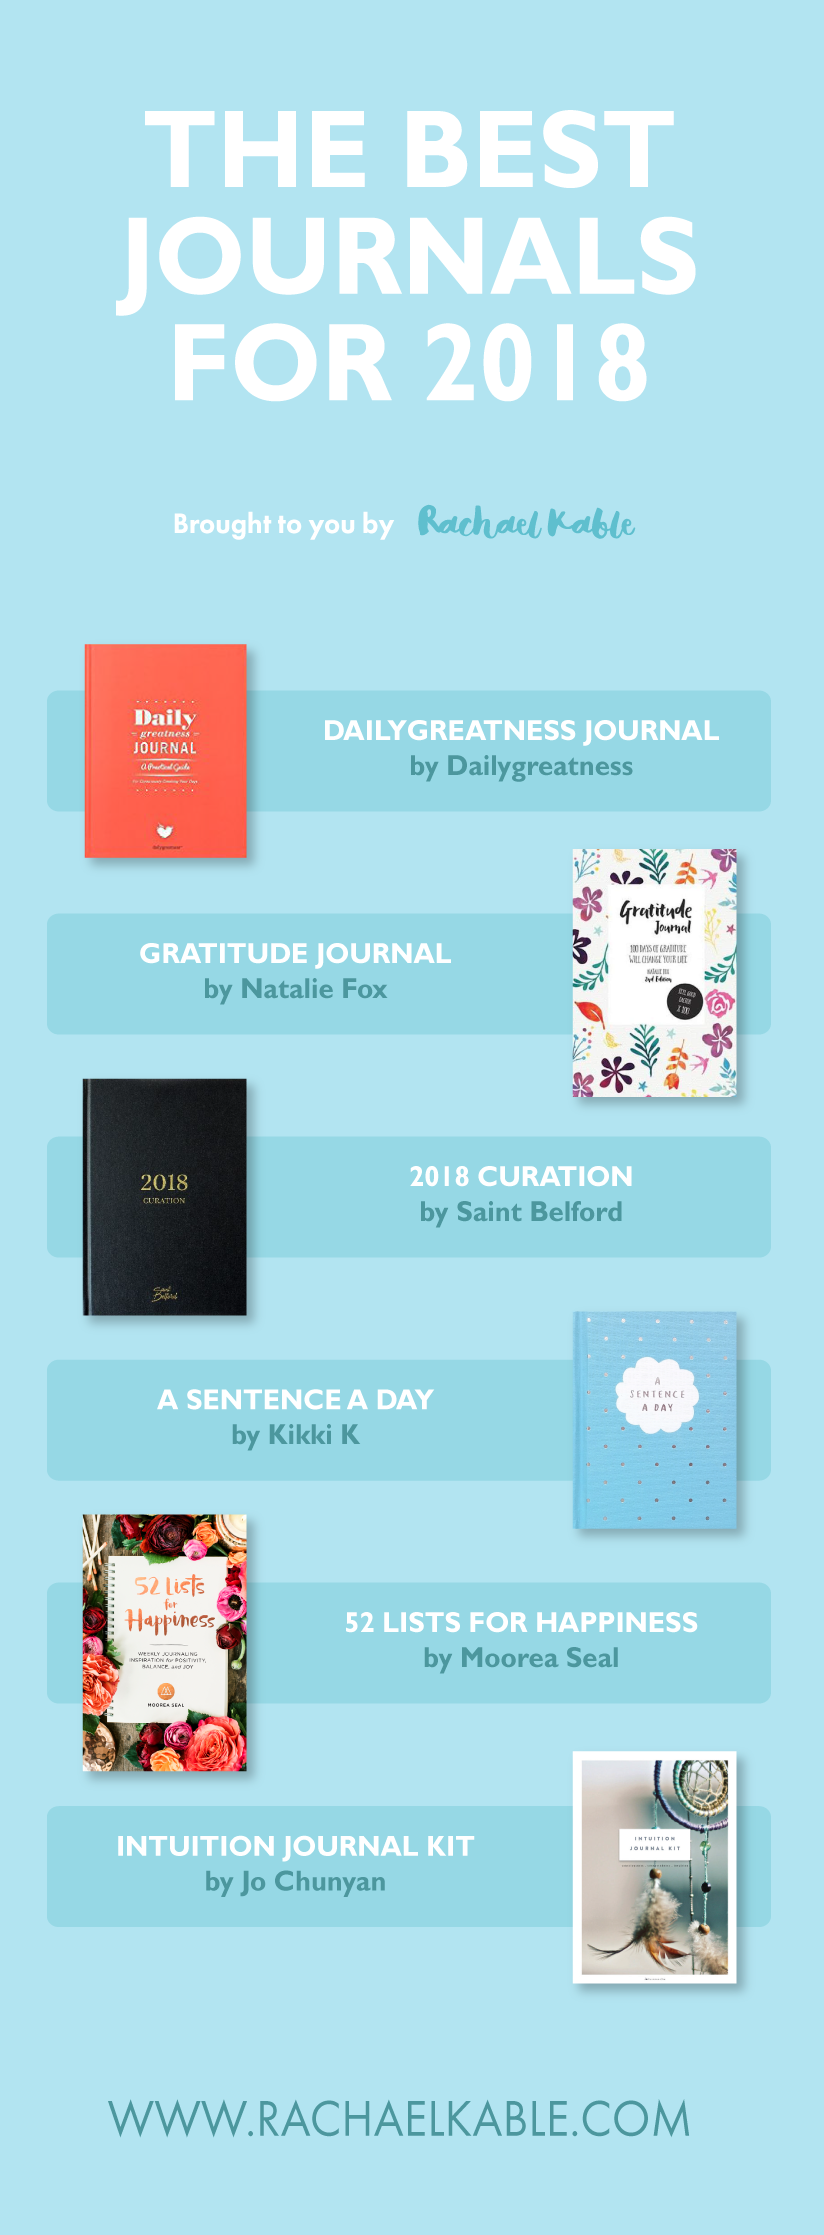 Best Journals for 2018